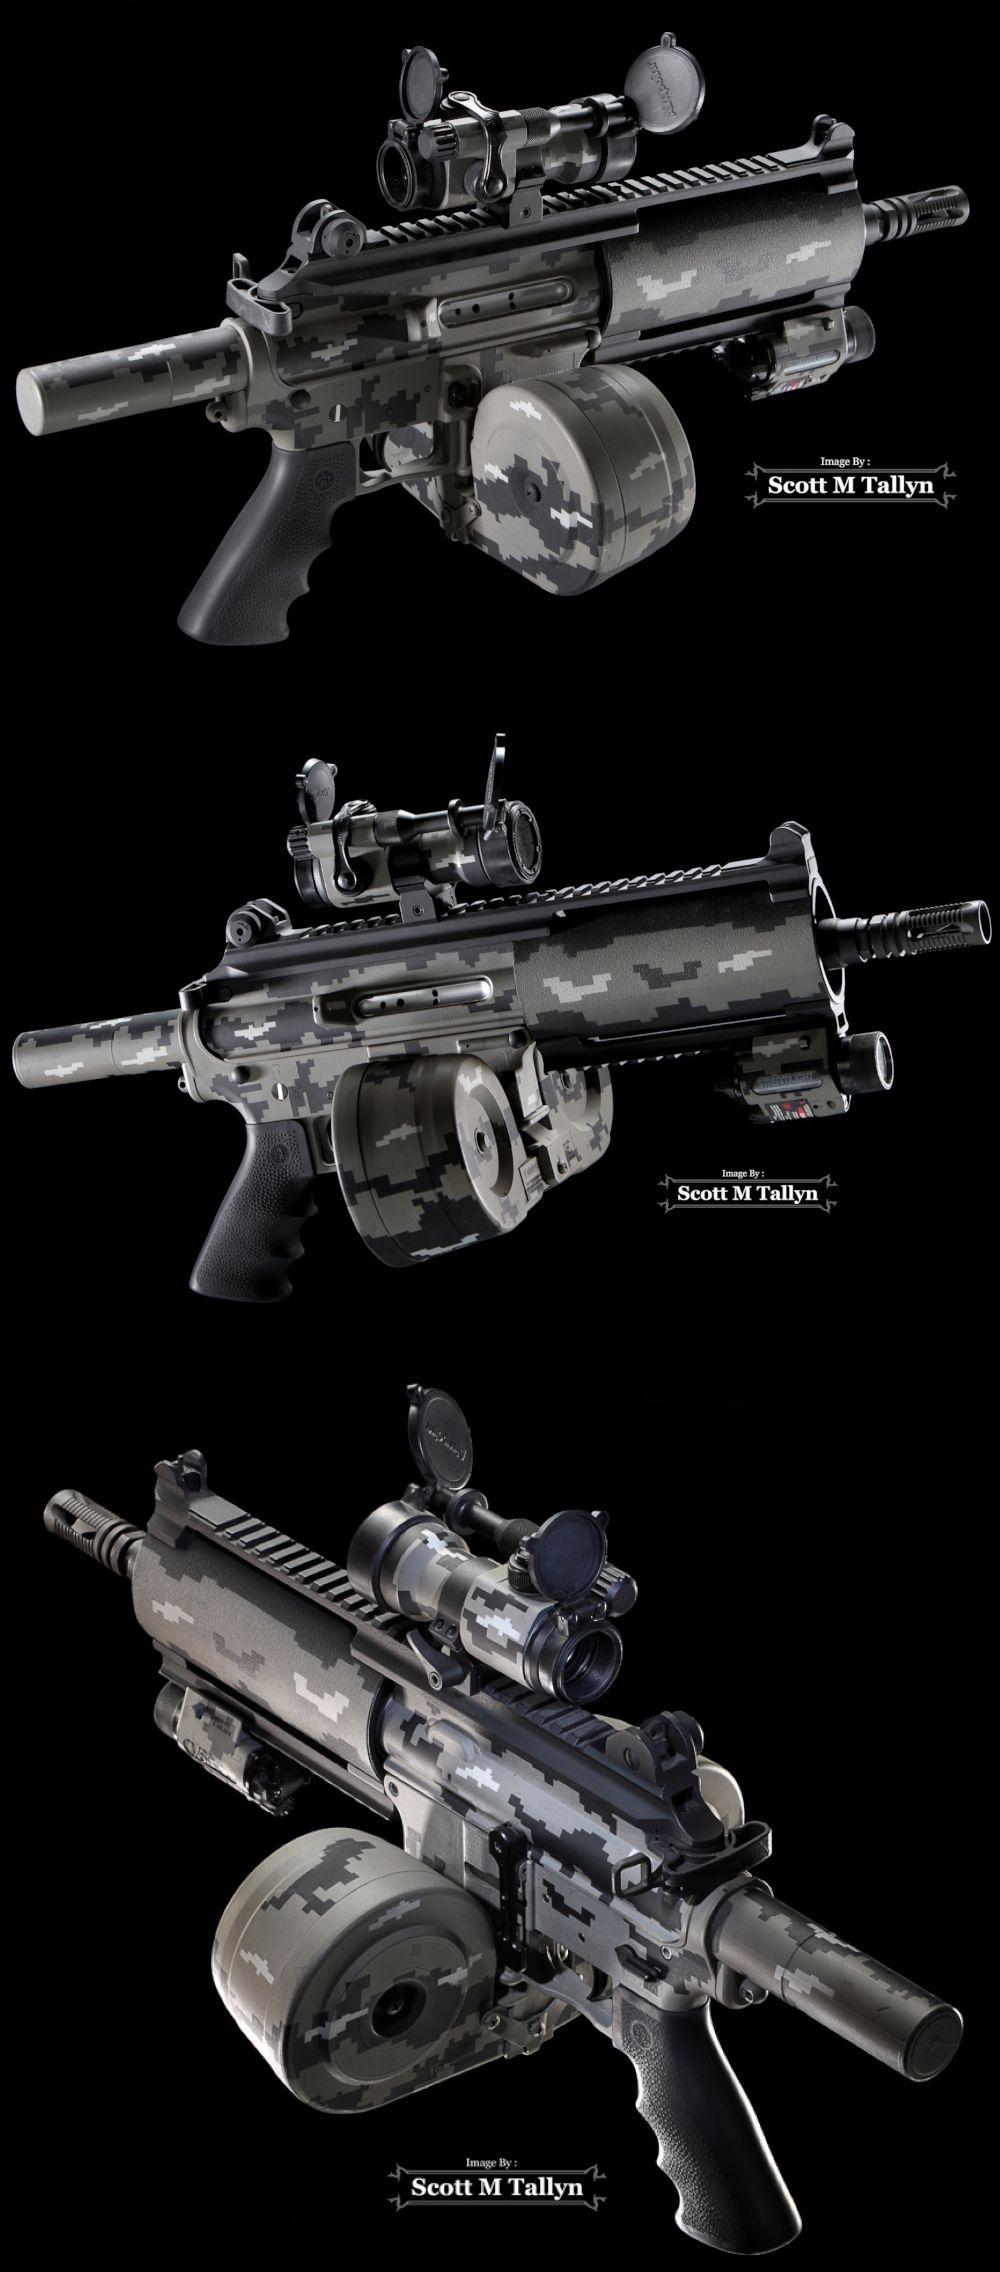 Bushmaster Carbon-15 Pistol Type: Custom Bushmaster Carbon